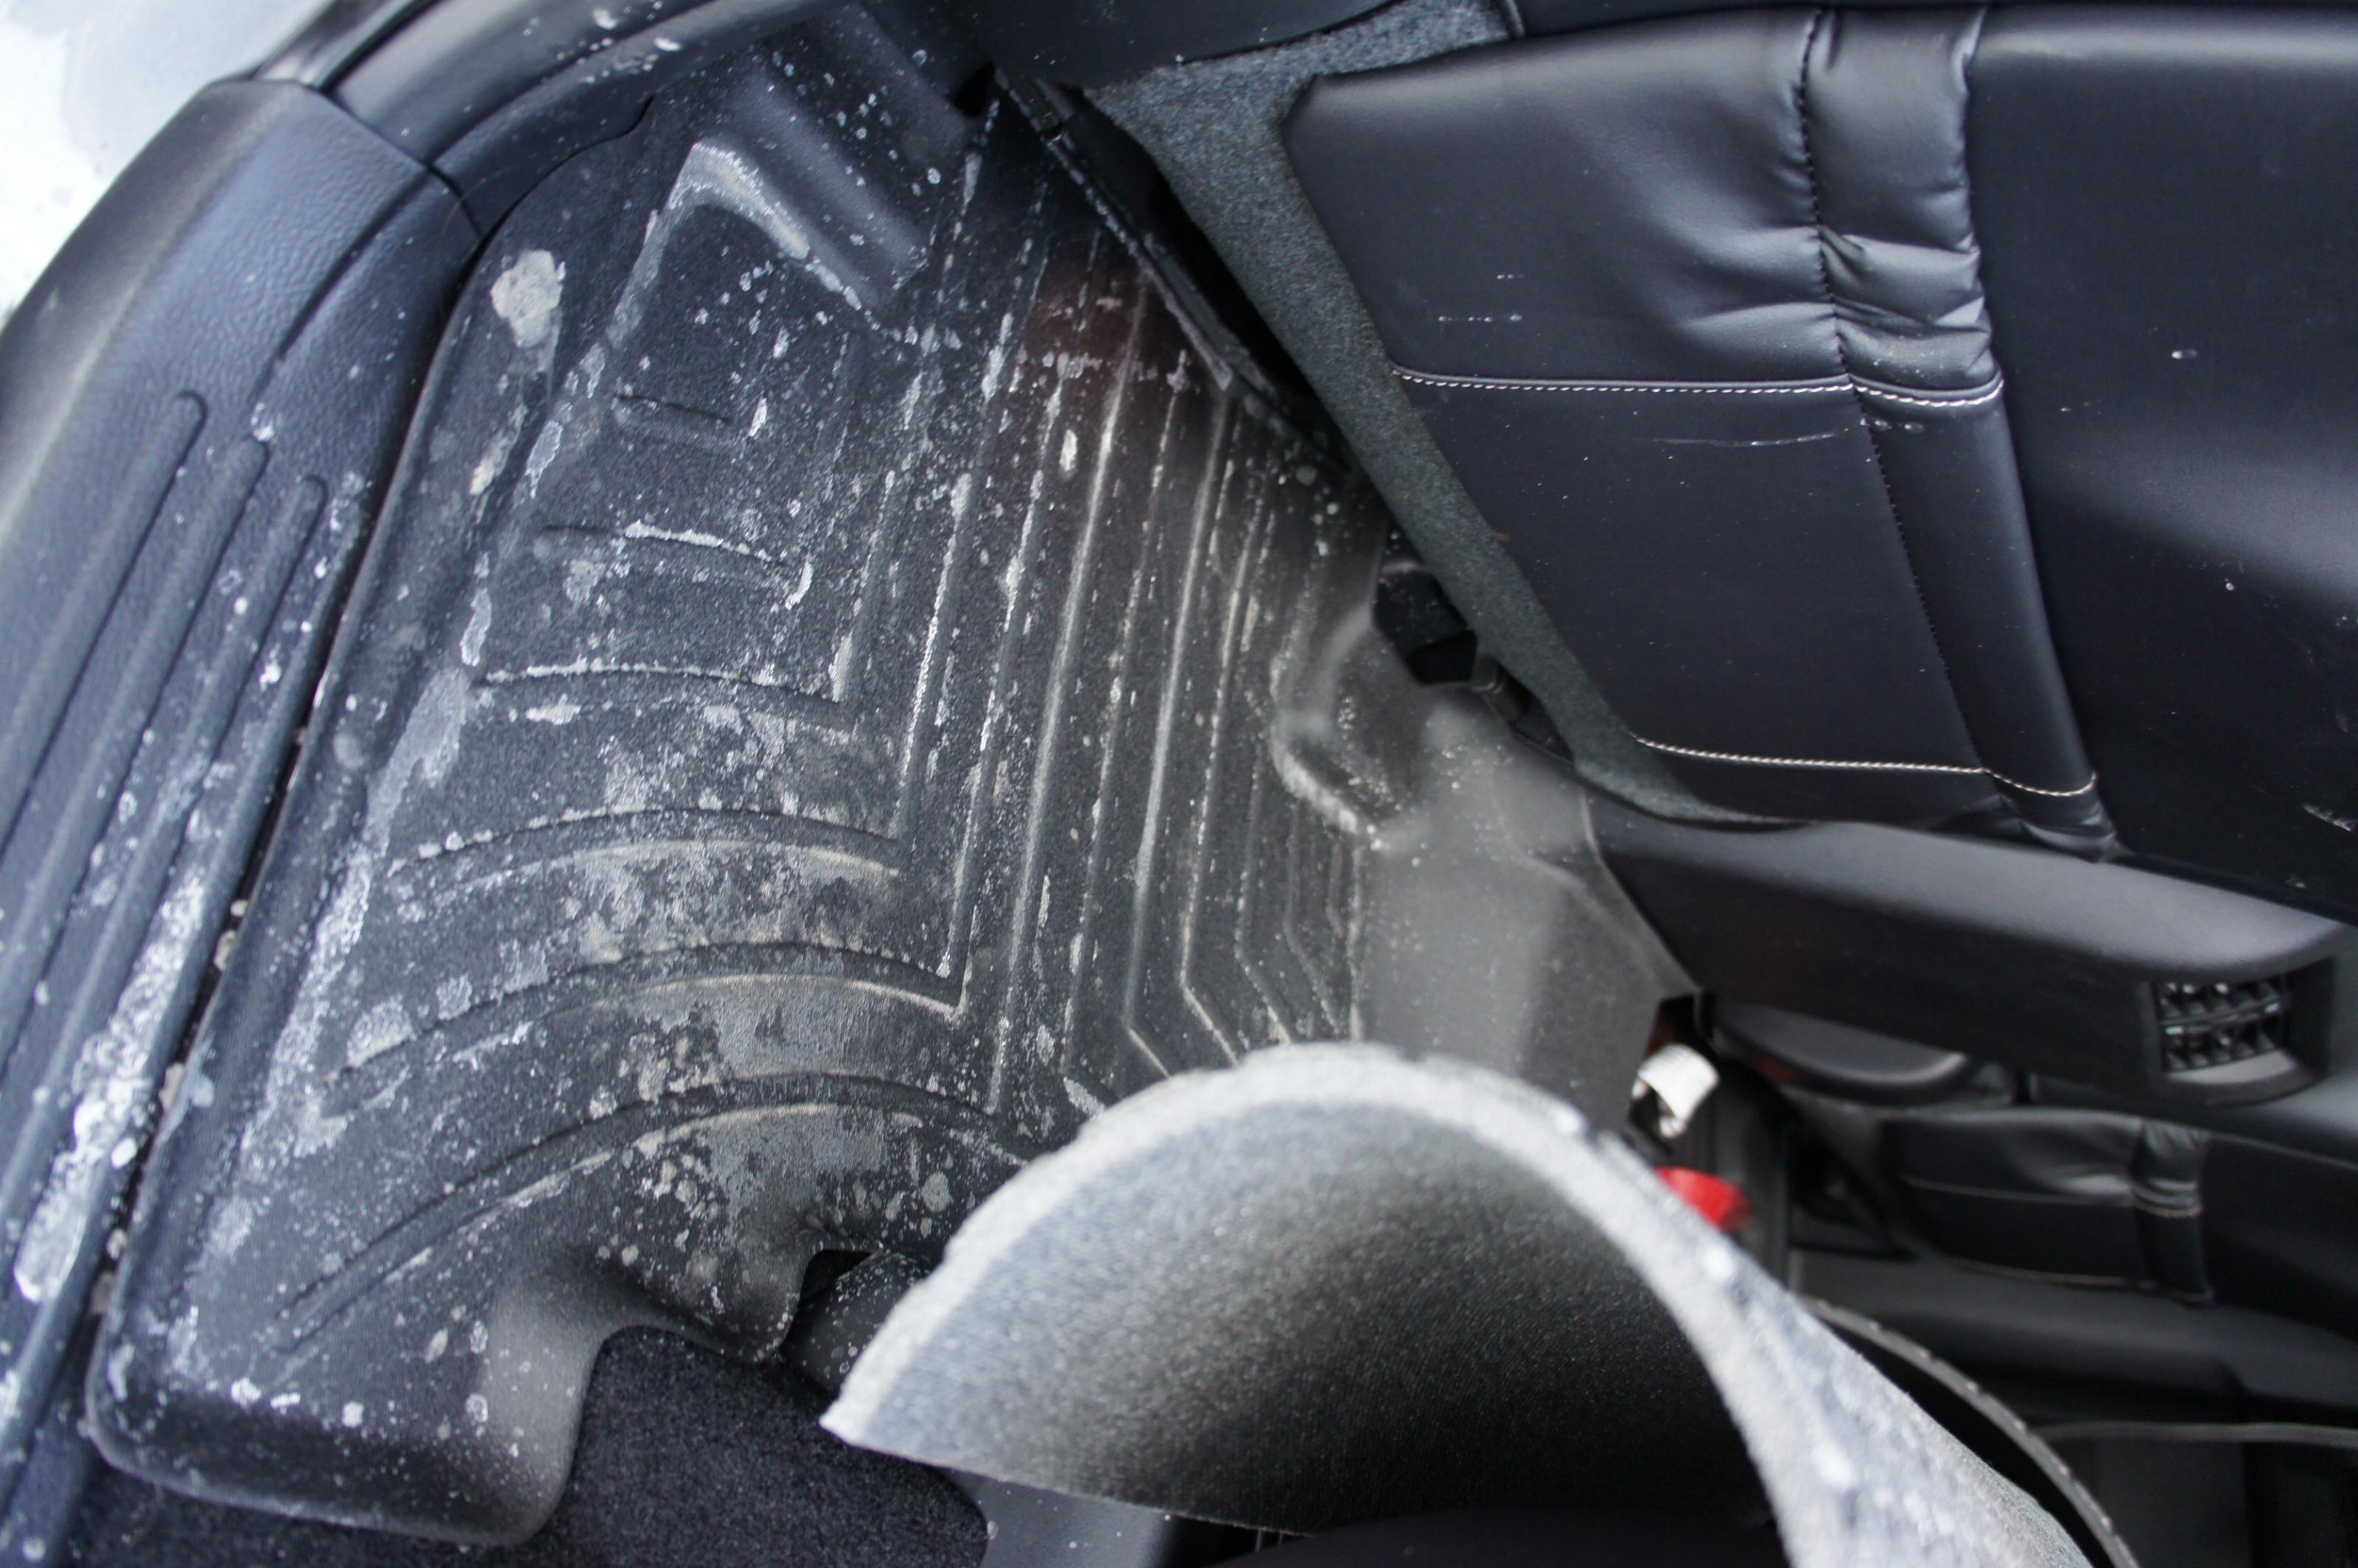 weathertech car mats vs liners